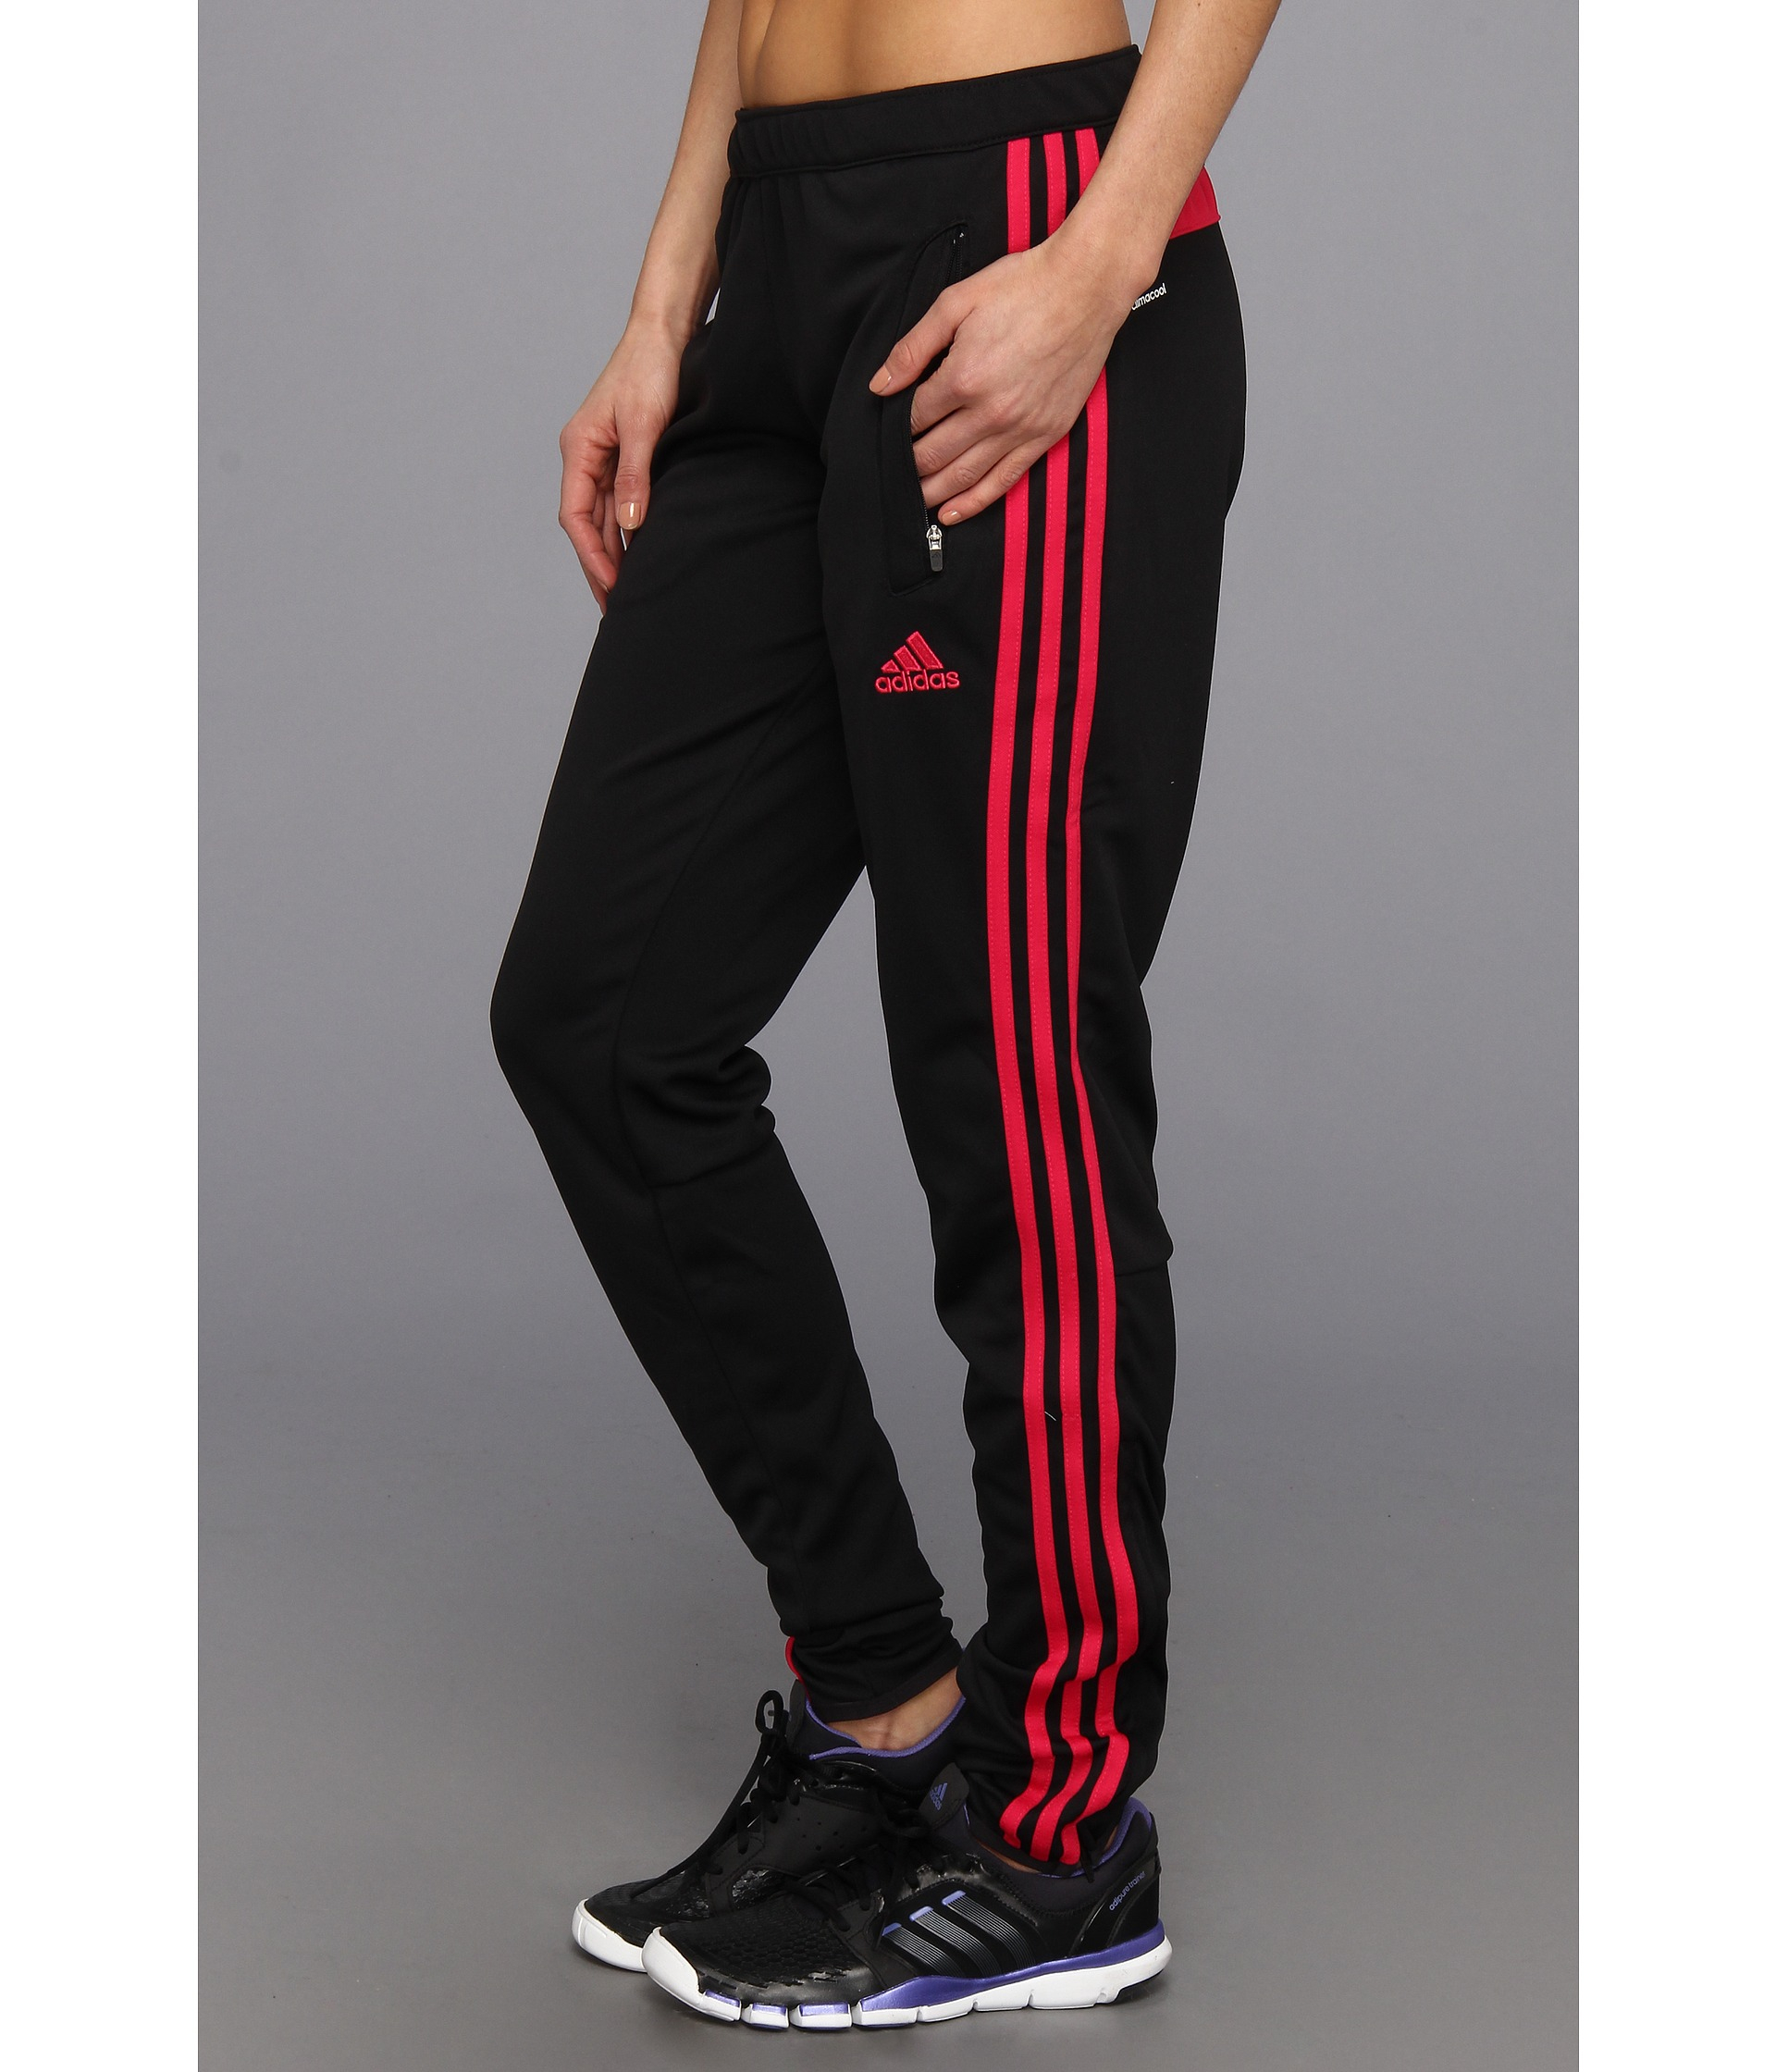 Lyst - adidas Tiro 13 Training Pant in Black 809e1e26c6